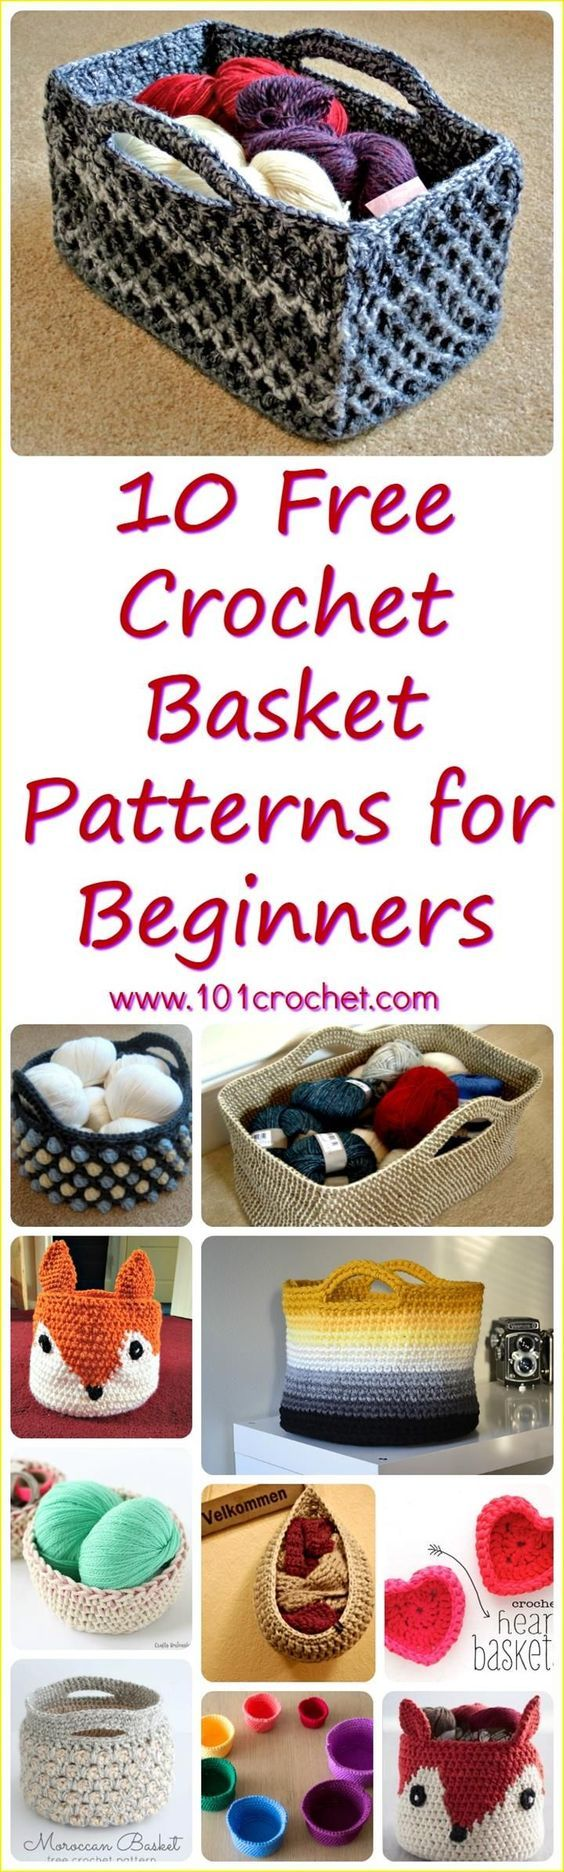 10 Free Crochet Basket Patterns for Beginners | Diy häkeln, Häkeln ...